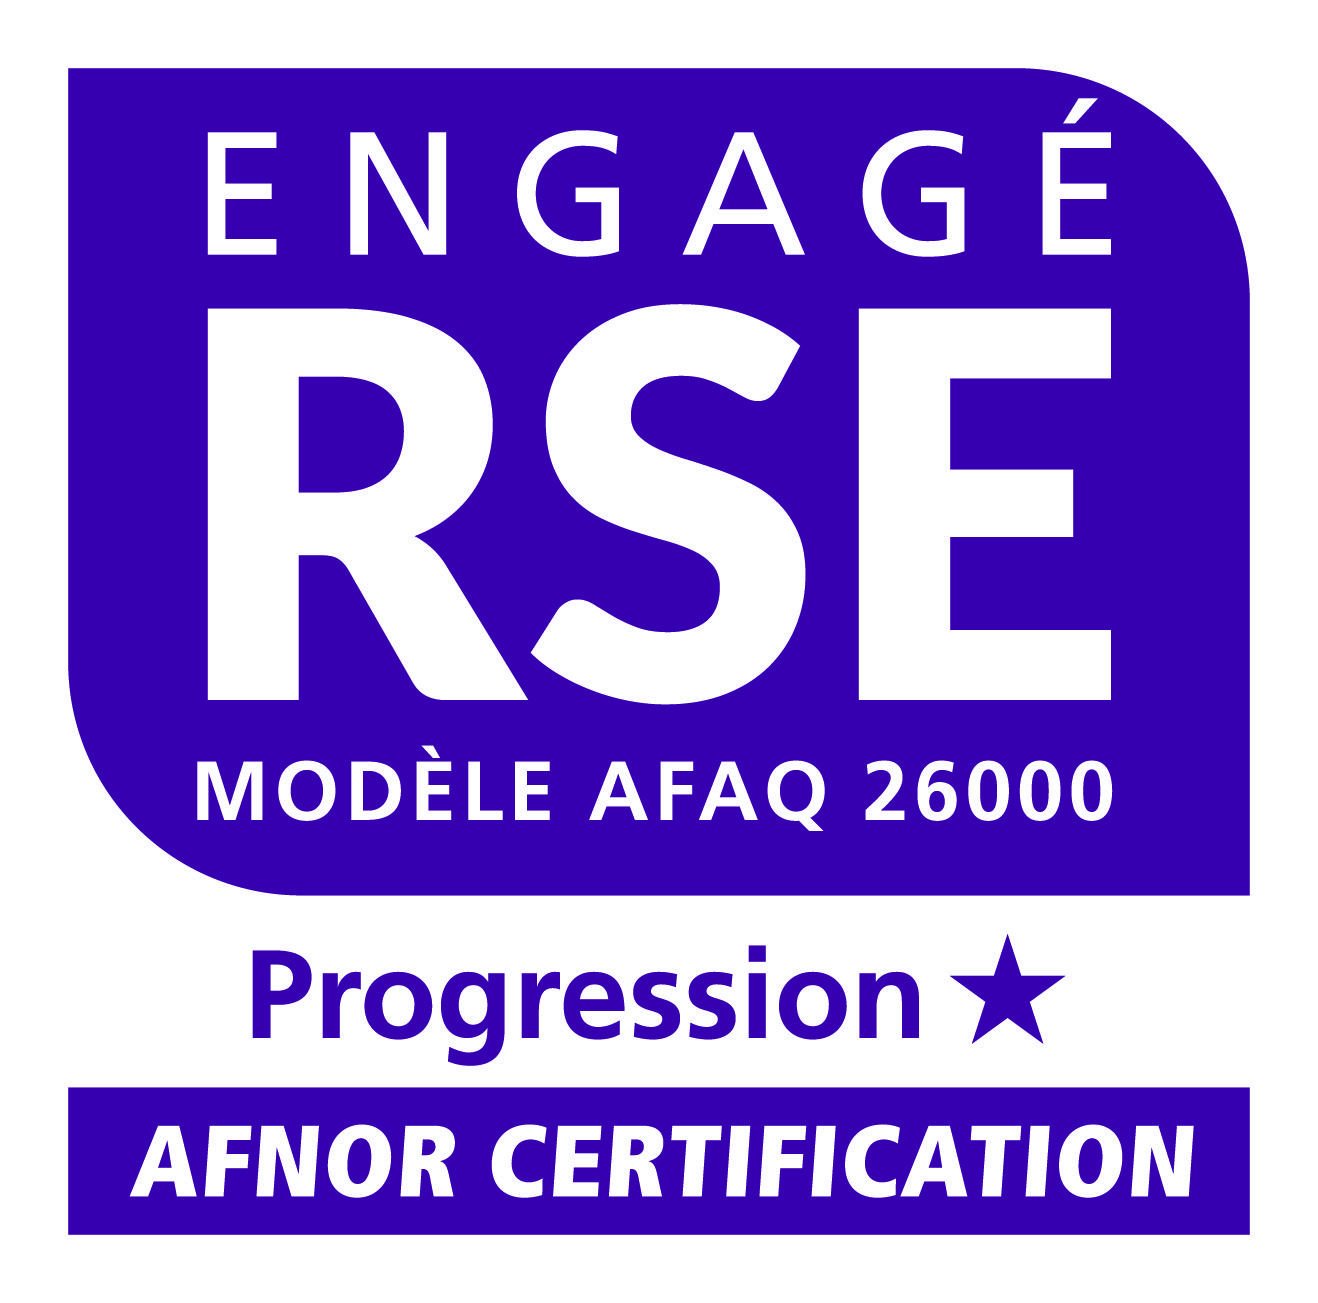 Logo Engagé RSE Progression AFNOR